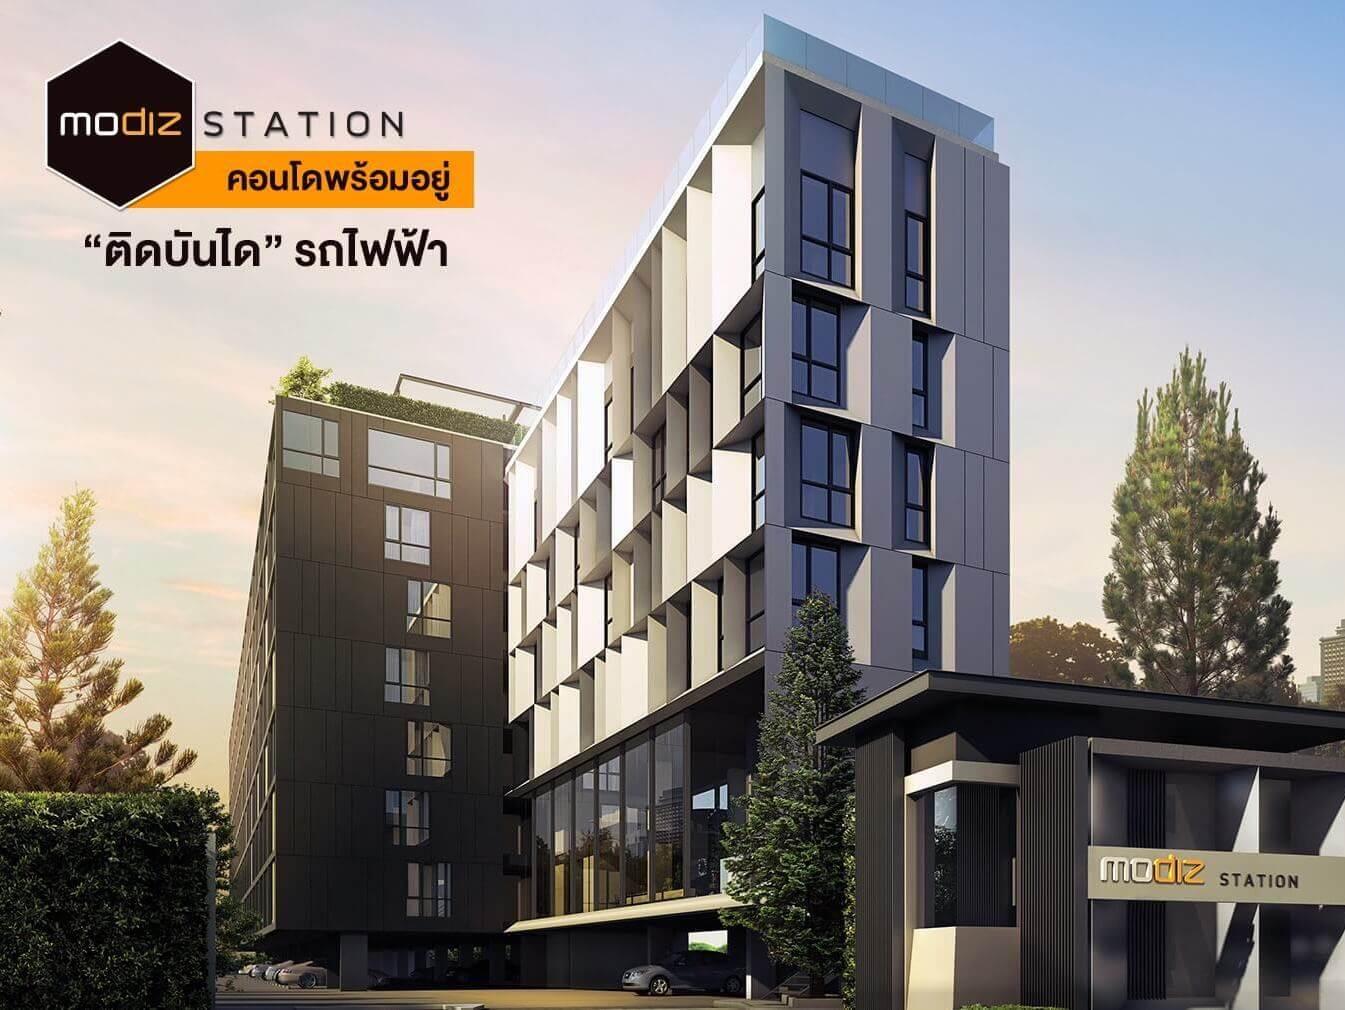 Modiz Station